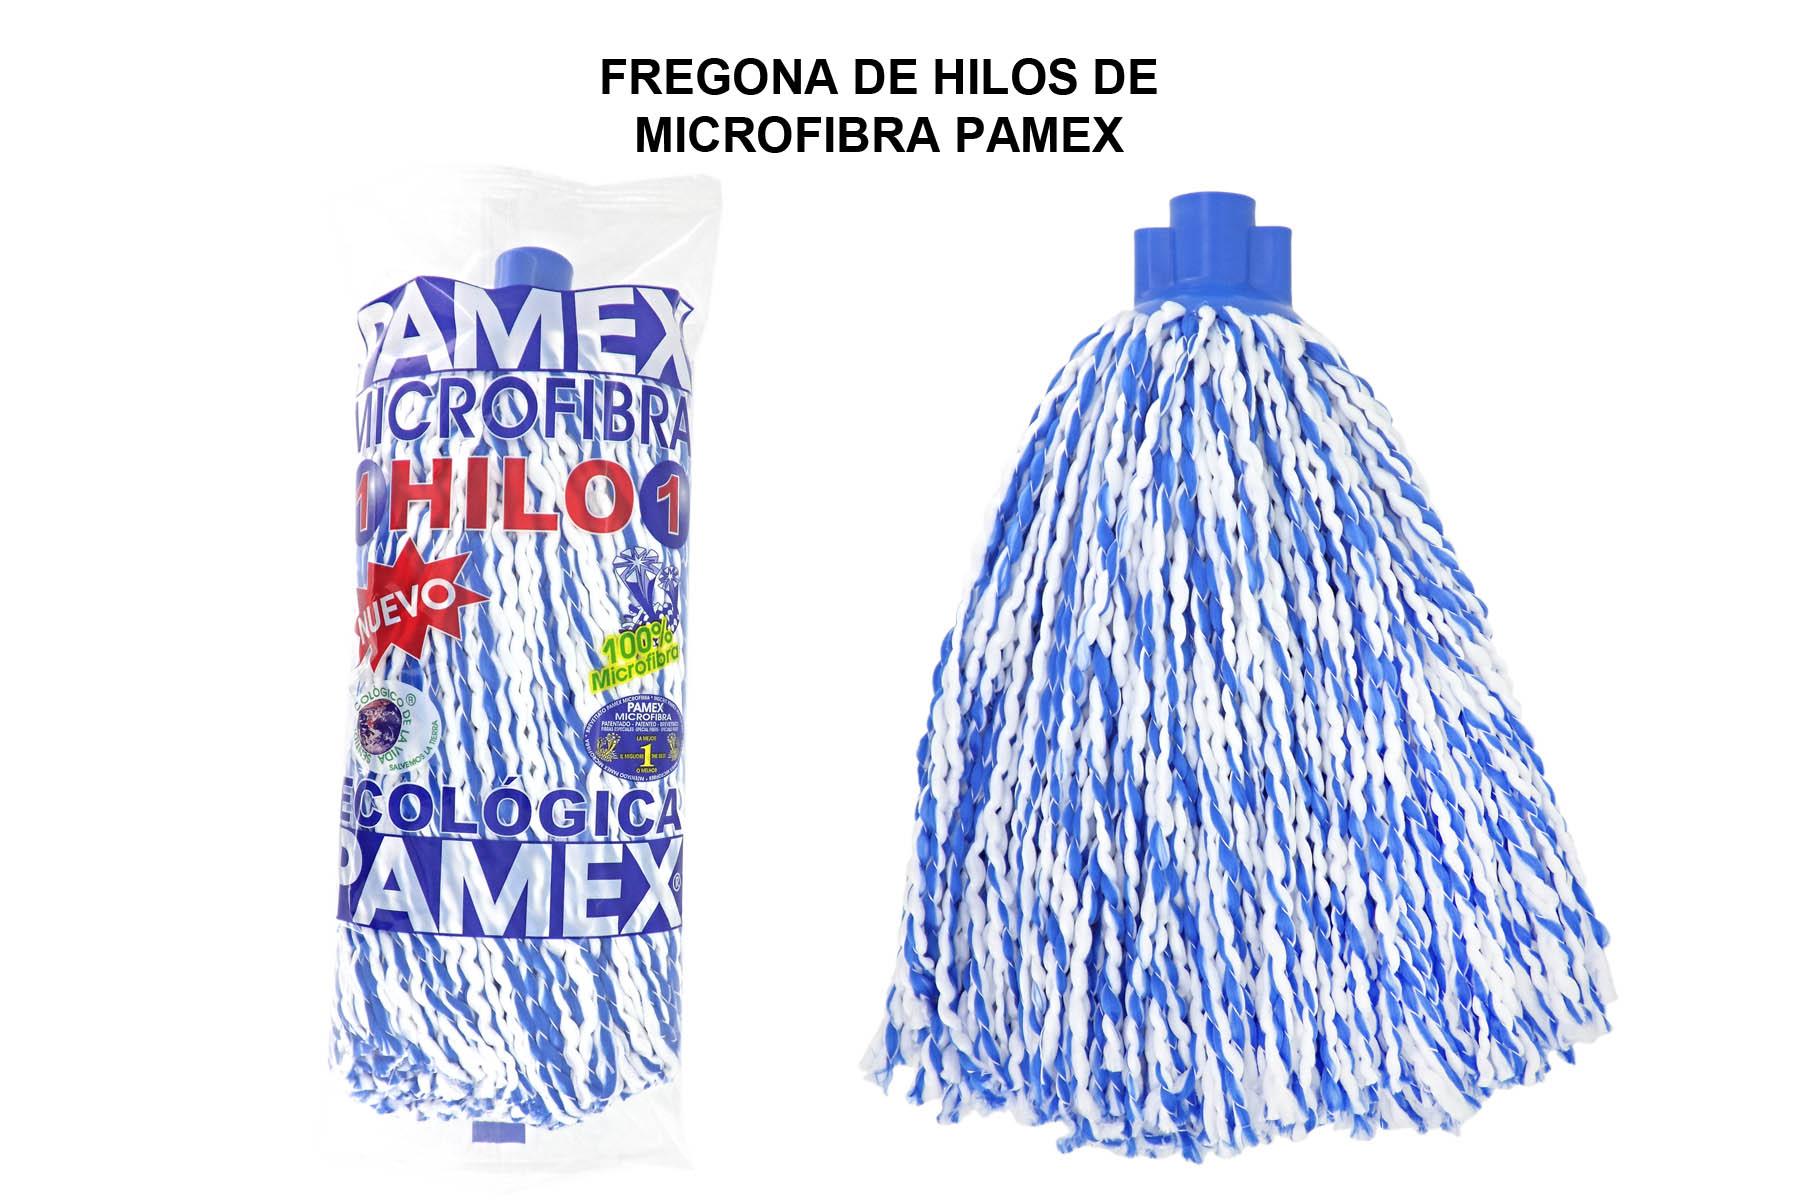 FREGONA DE HILOS DE MICROFIBRA PAMEX